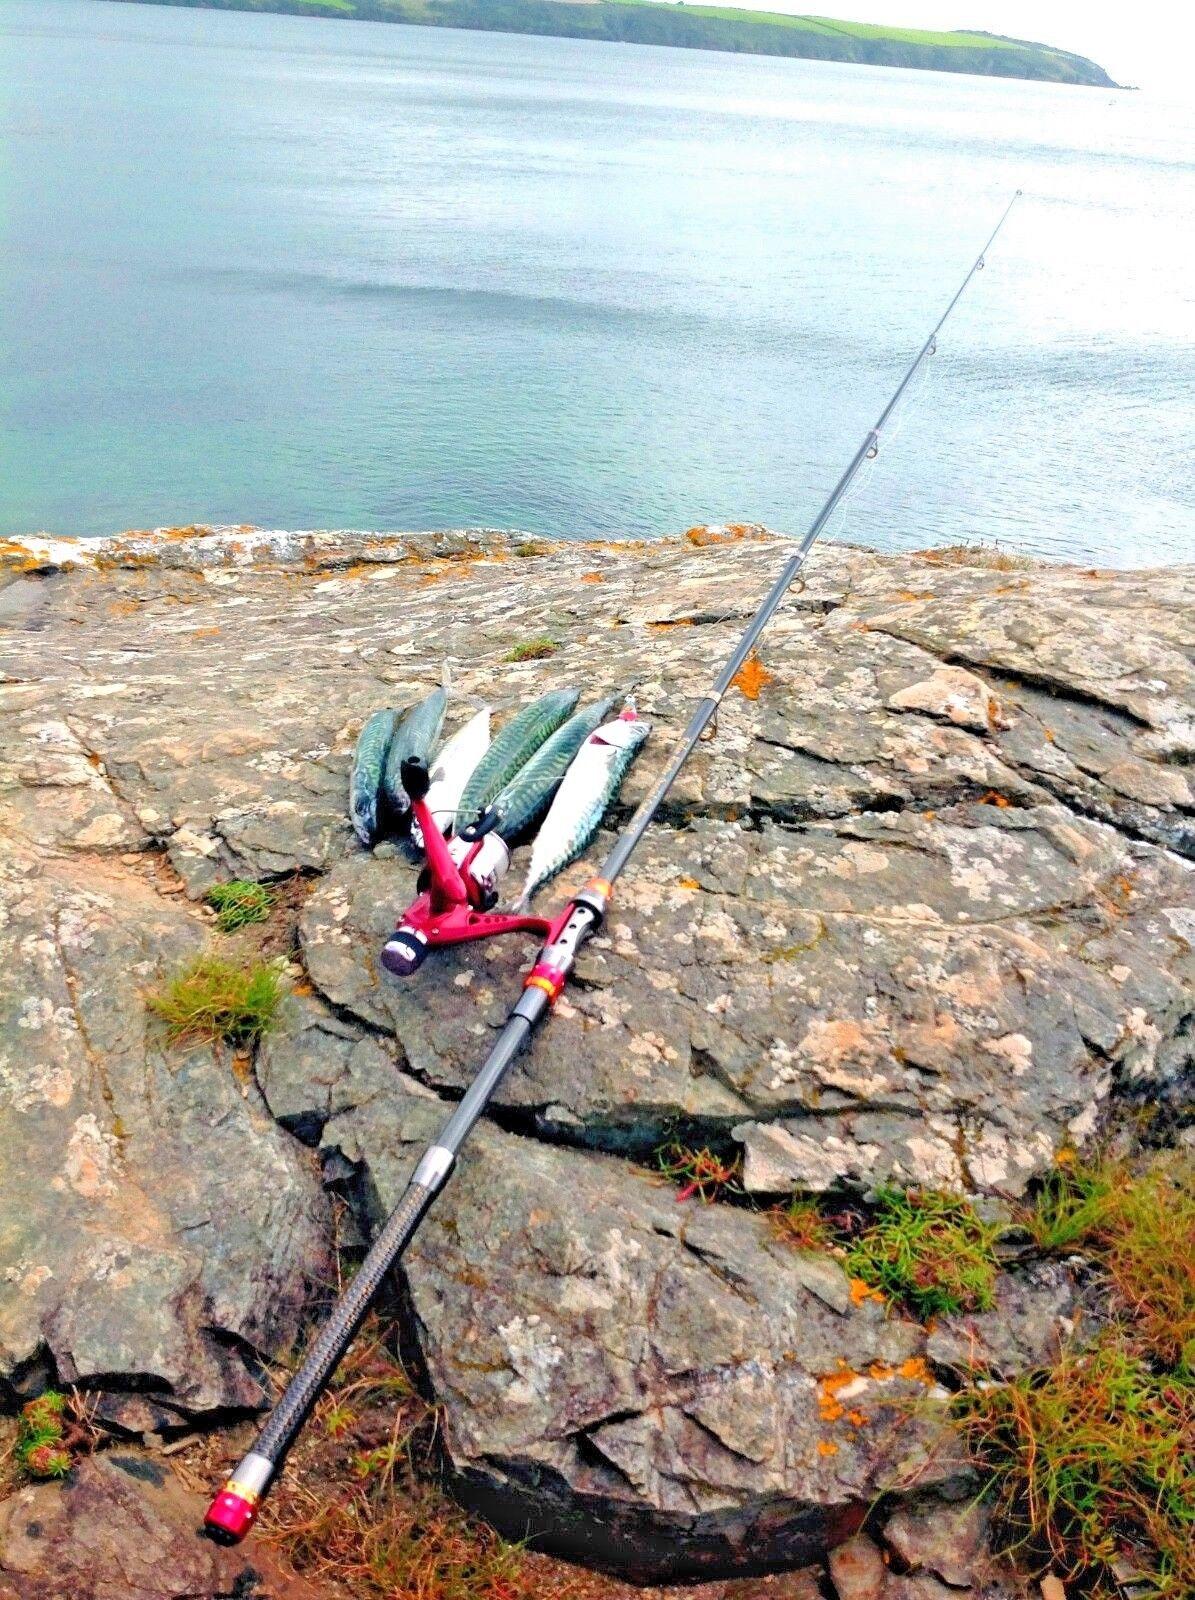 TRAVEL CARBON 3.0 METRE FISHING ROD & REEL SET inc LINE, CARP,CHUB,PIKE,PERCH